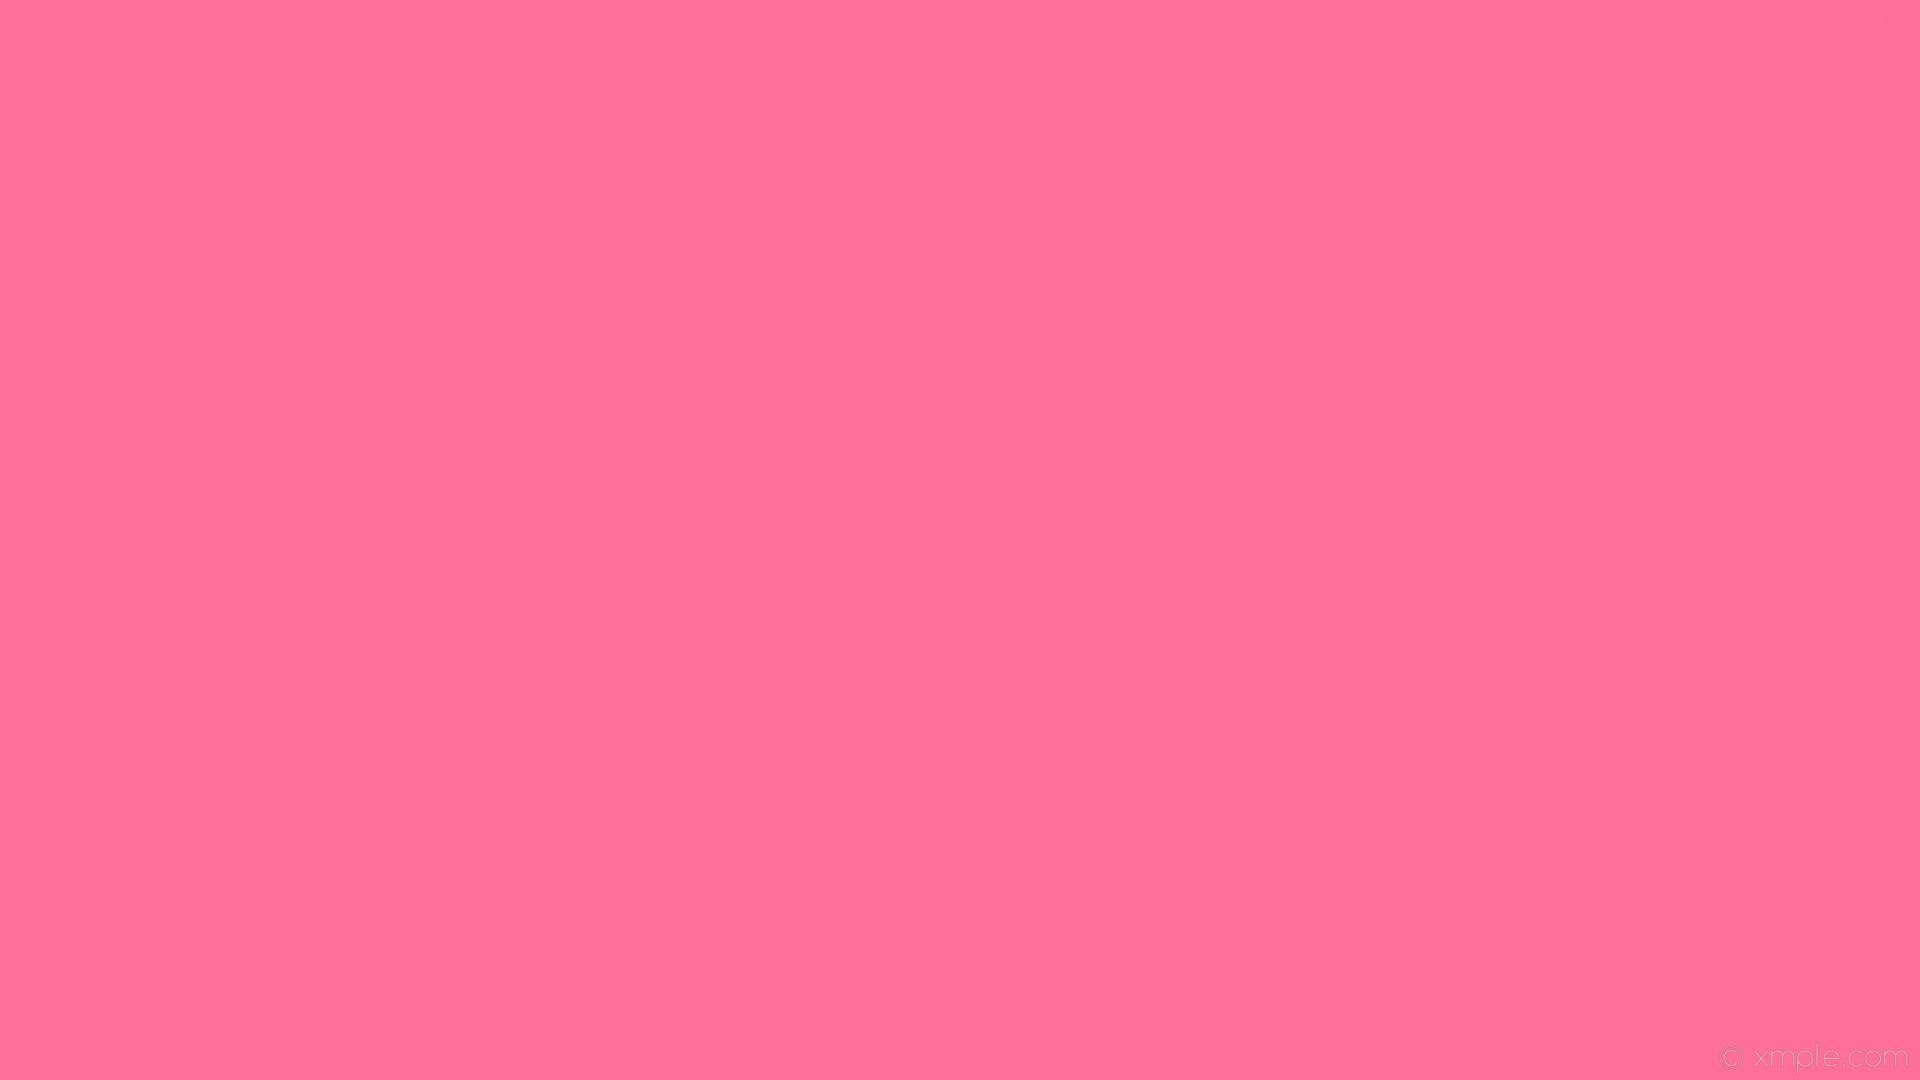 wallpaper solid color pink plain one colour single #ff7096